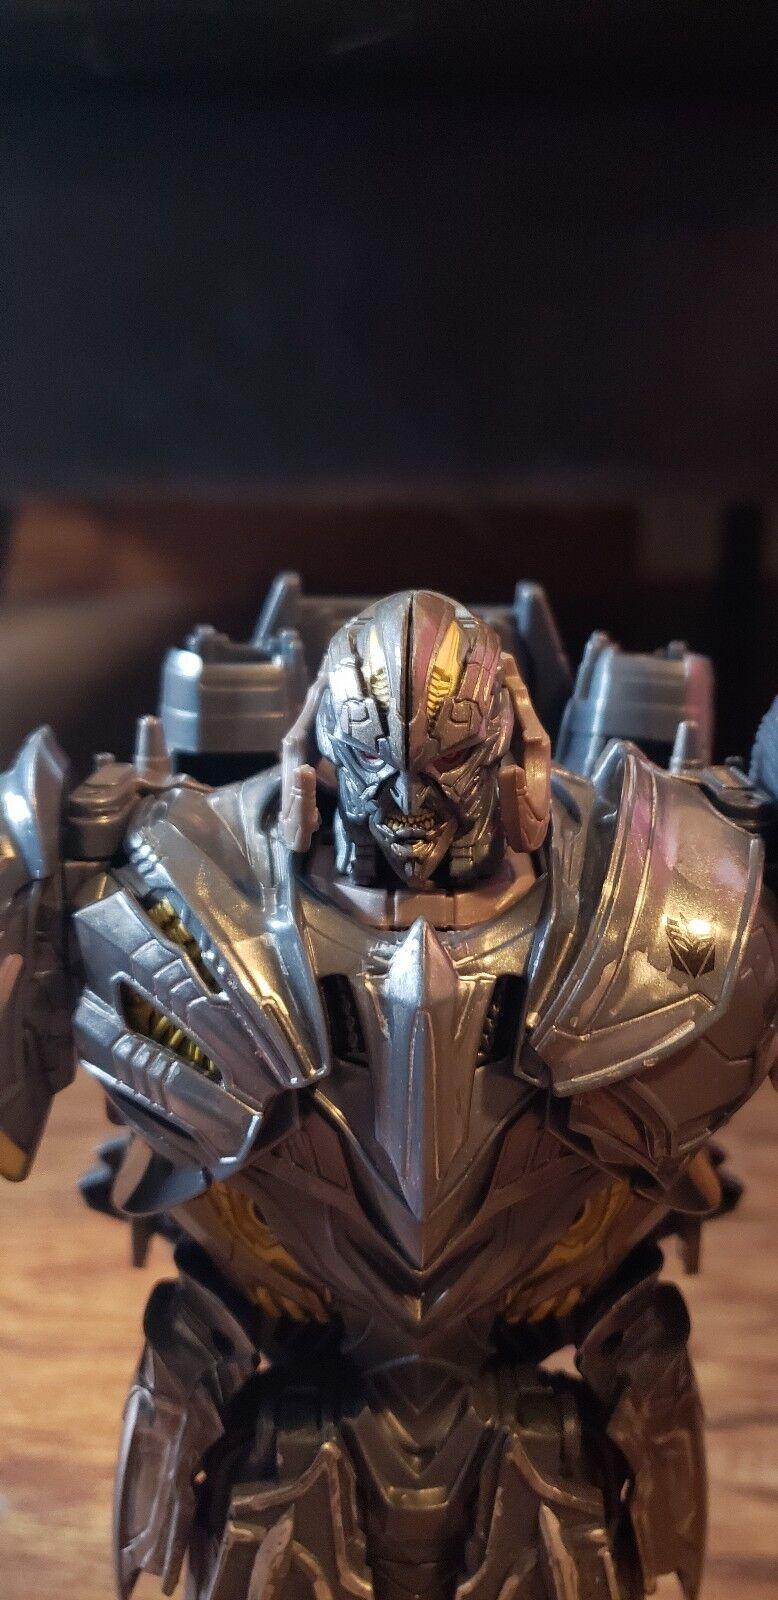 The last Knight Leader Class Megatron Megatron Megatron 9dddf1